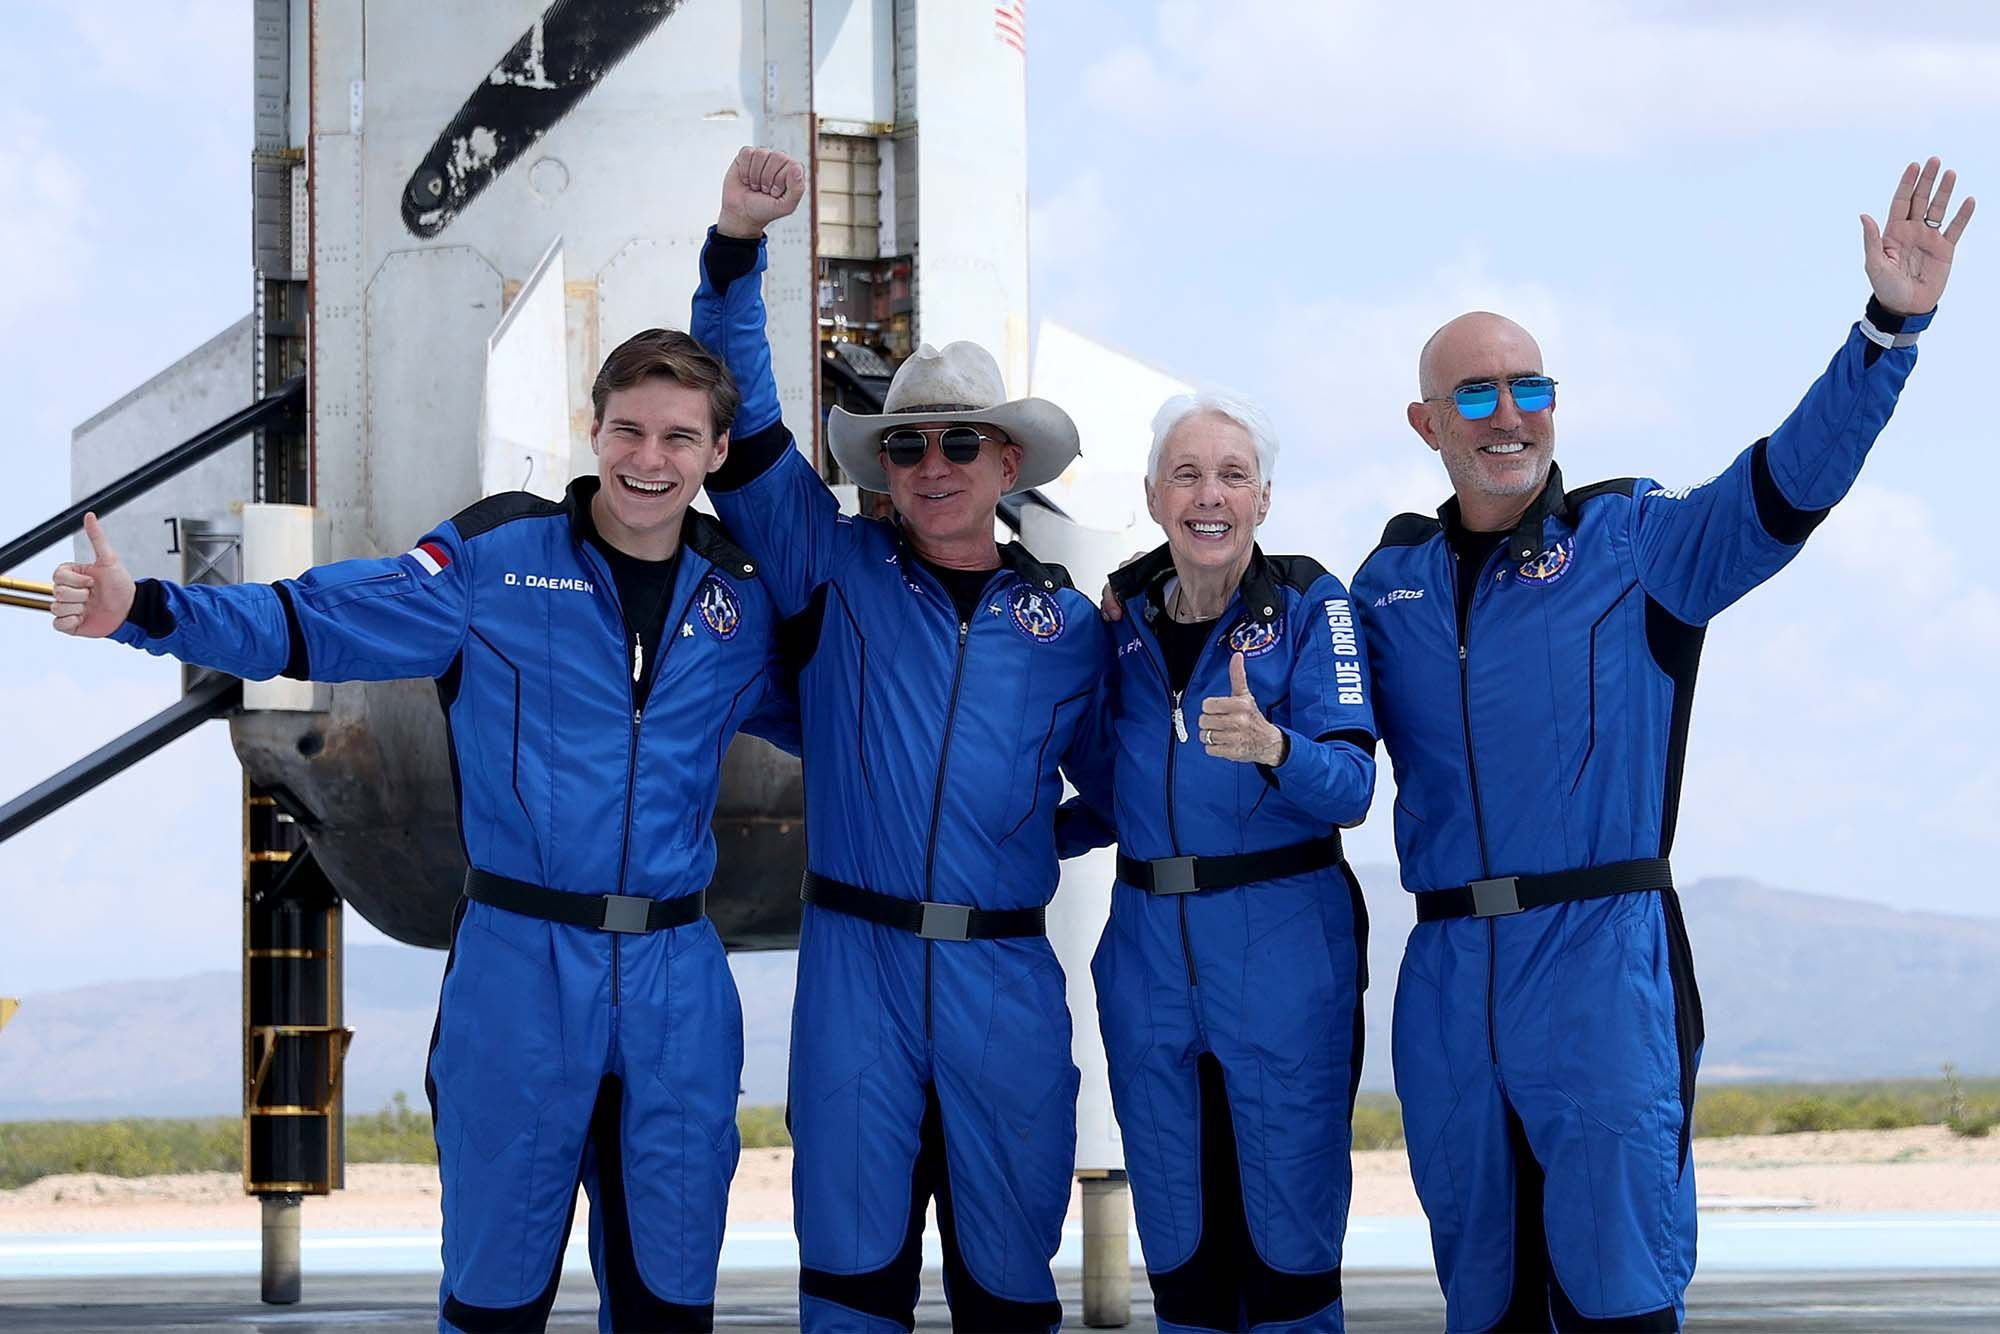 Blue Origin's New Shepard crew Oliver Daemen, Jeff Bezos, Wally Funk, and Mark Bezos. (Photo: Getty Images)